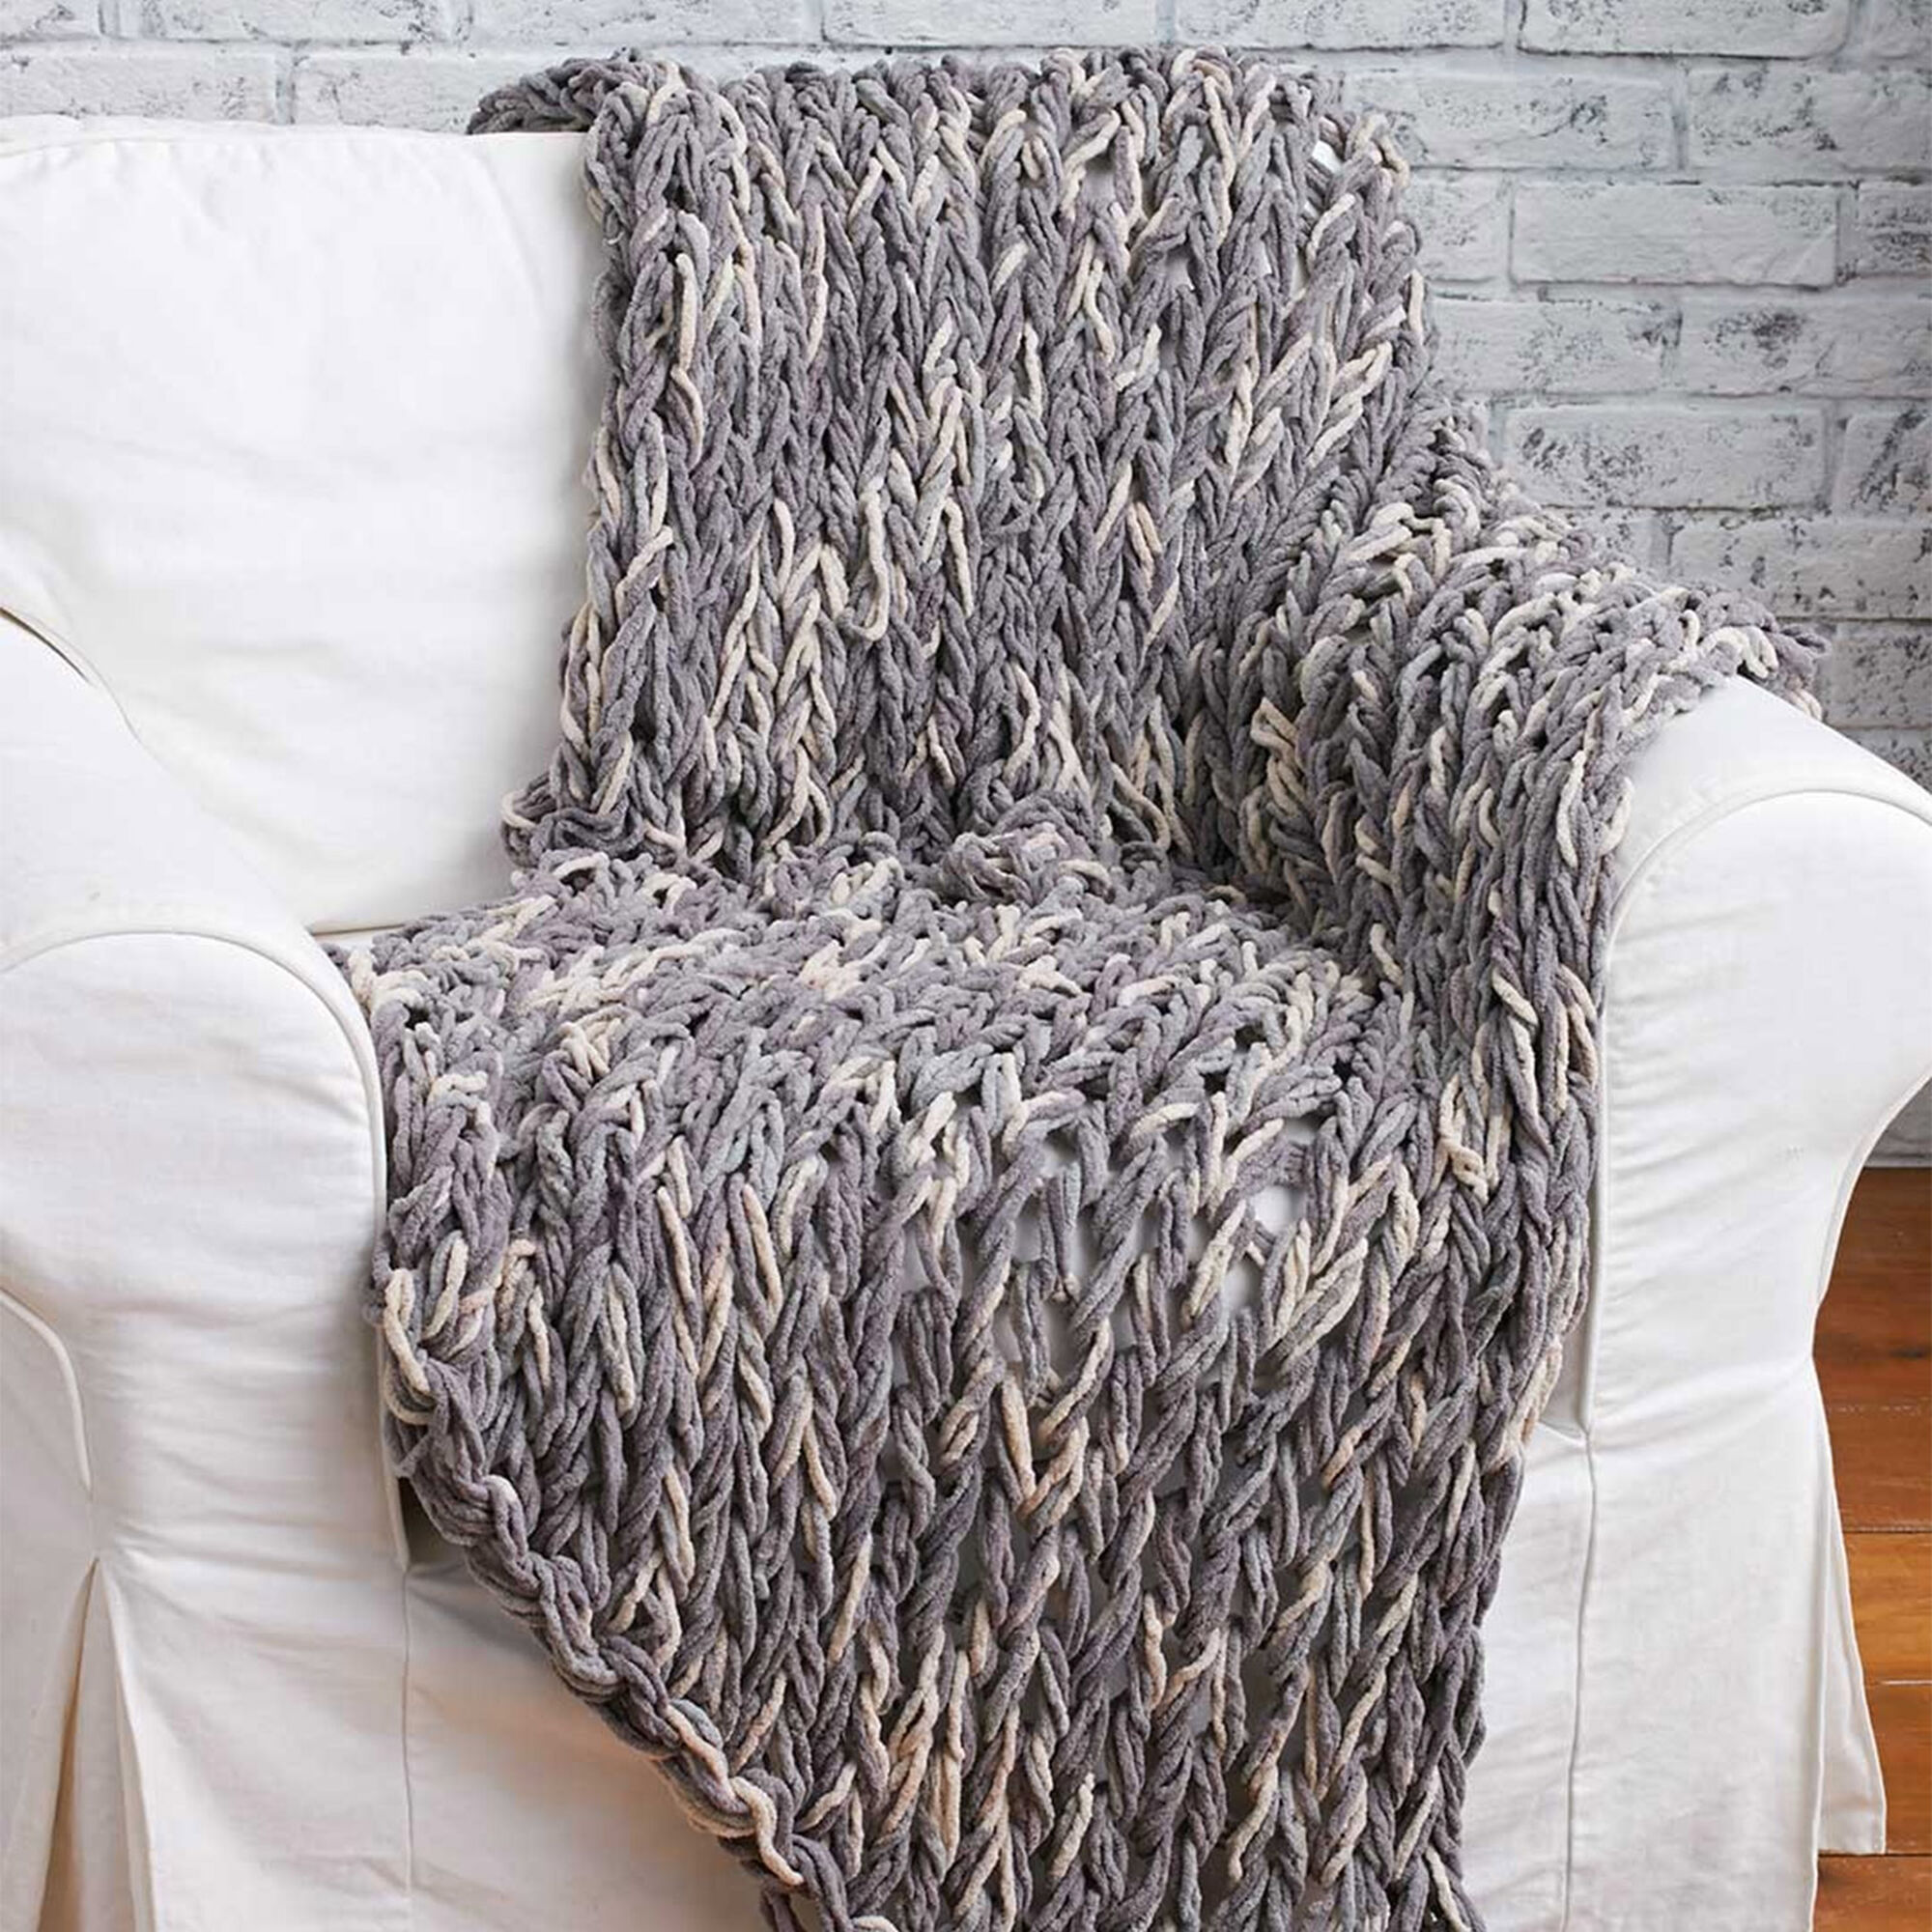 Bernat Arm Knit 3-Hour Blanket | Yarnspirations